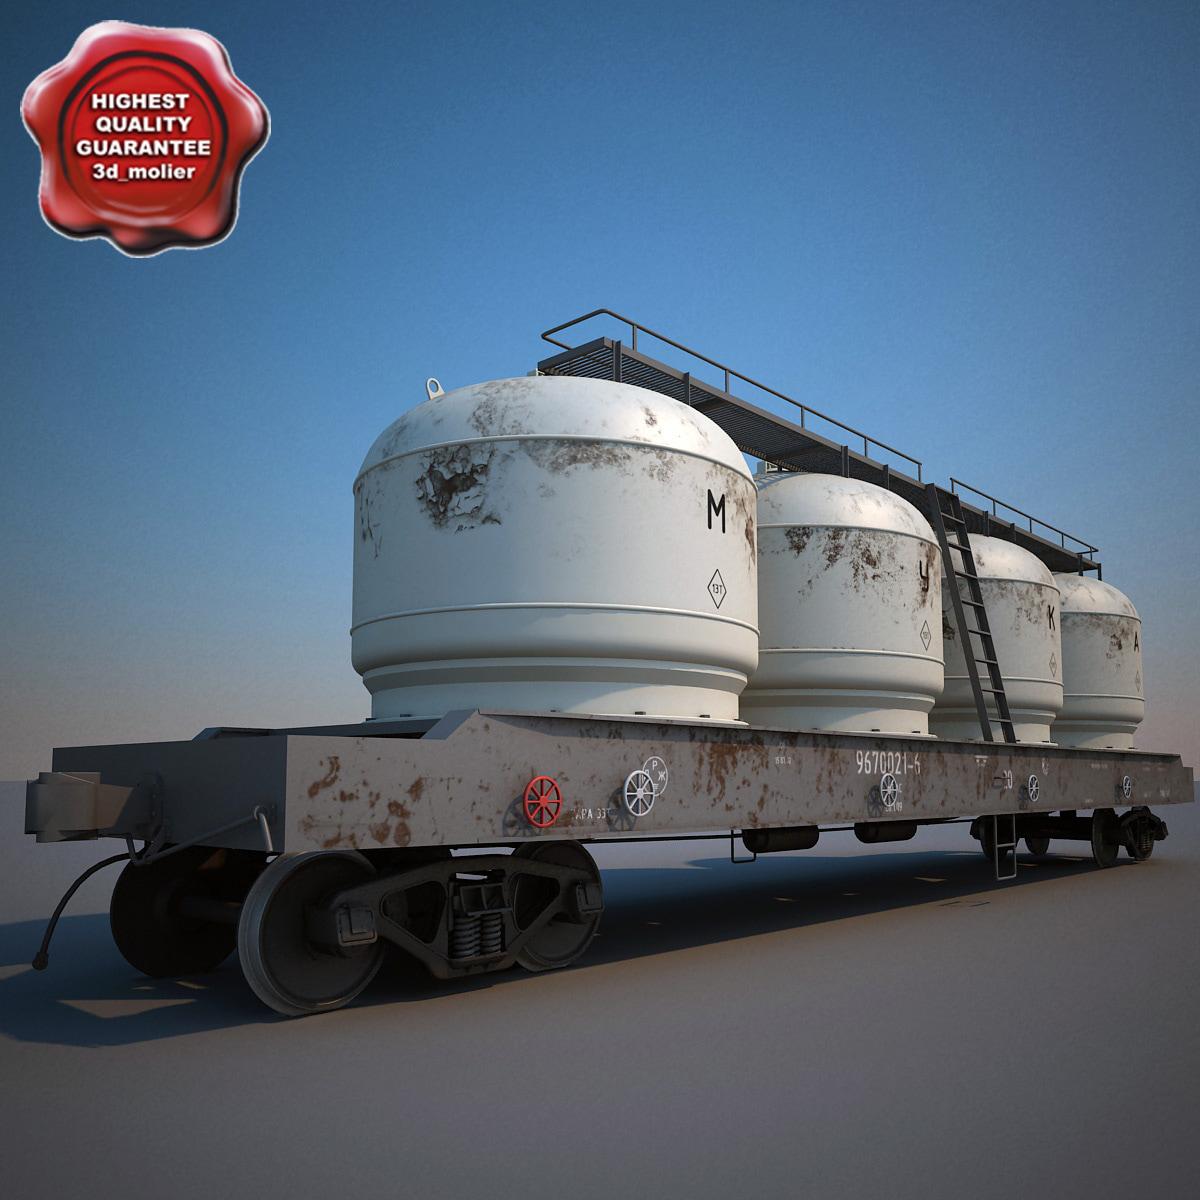 3ds max hopper wagon 17-4020